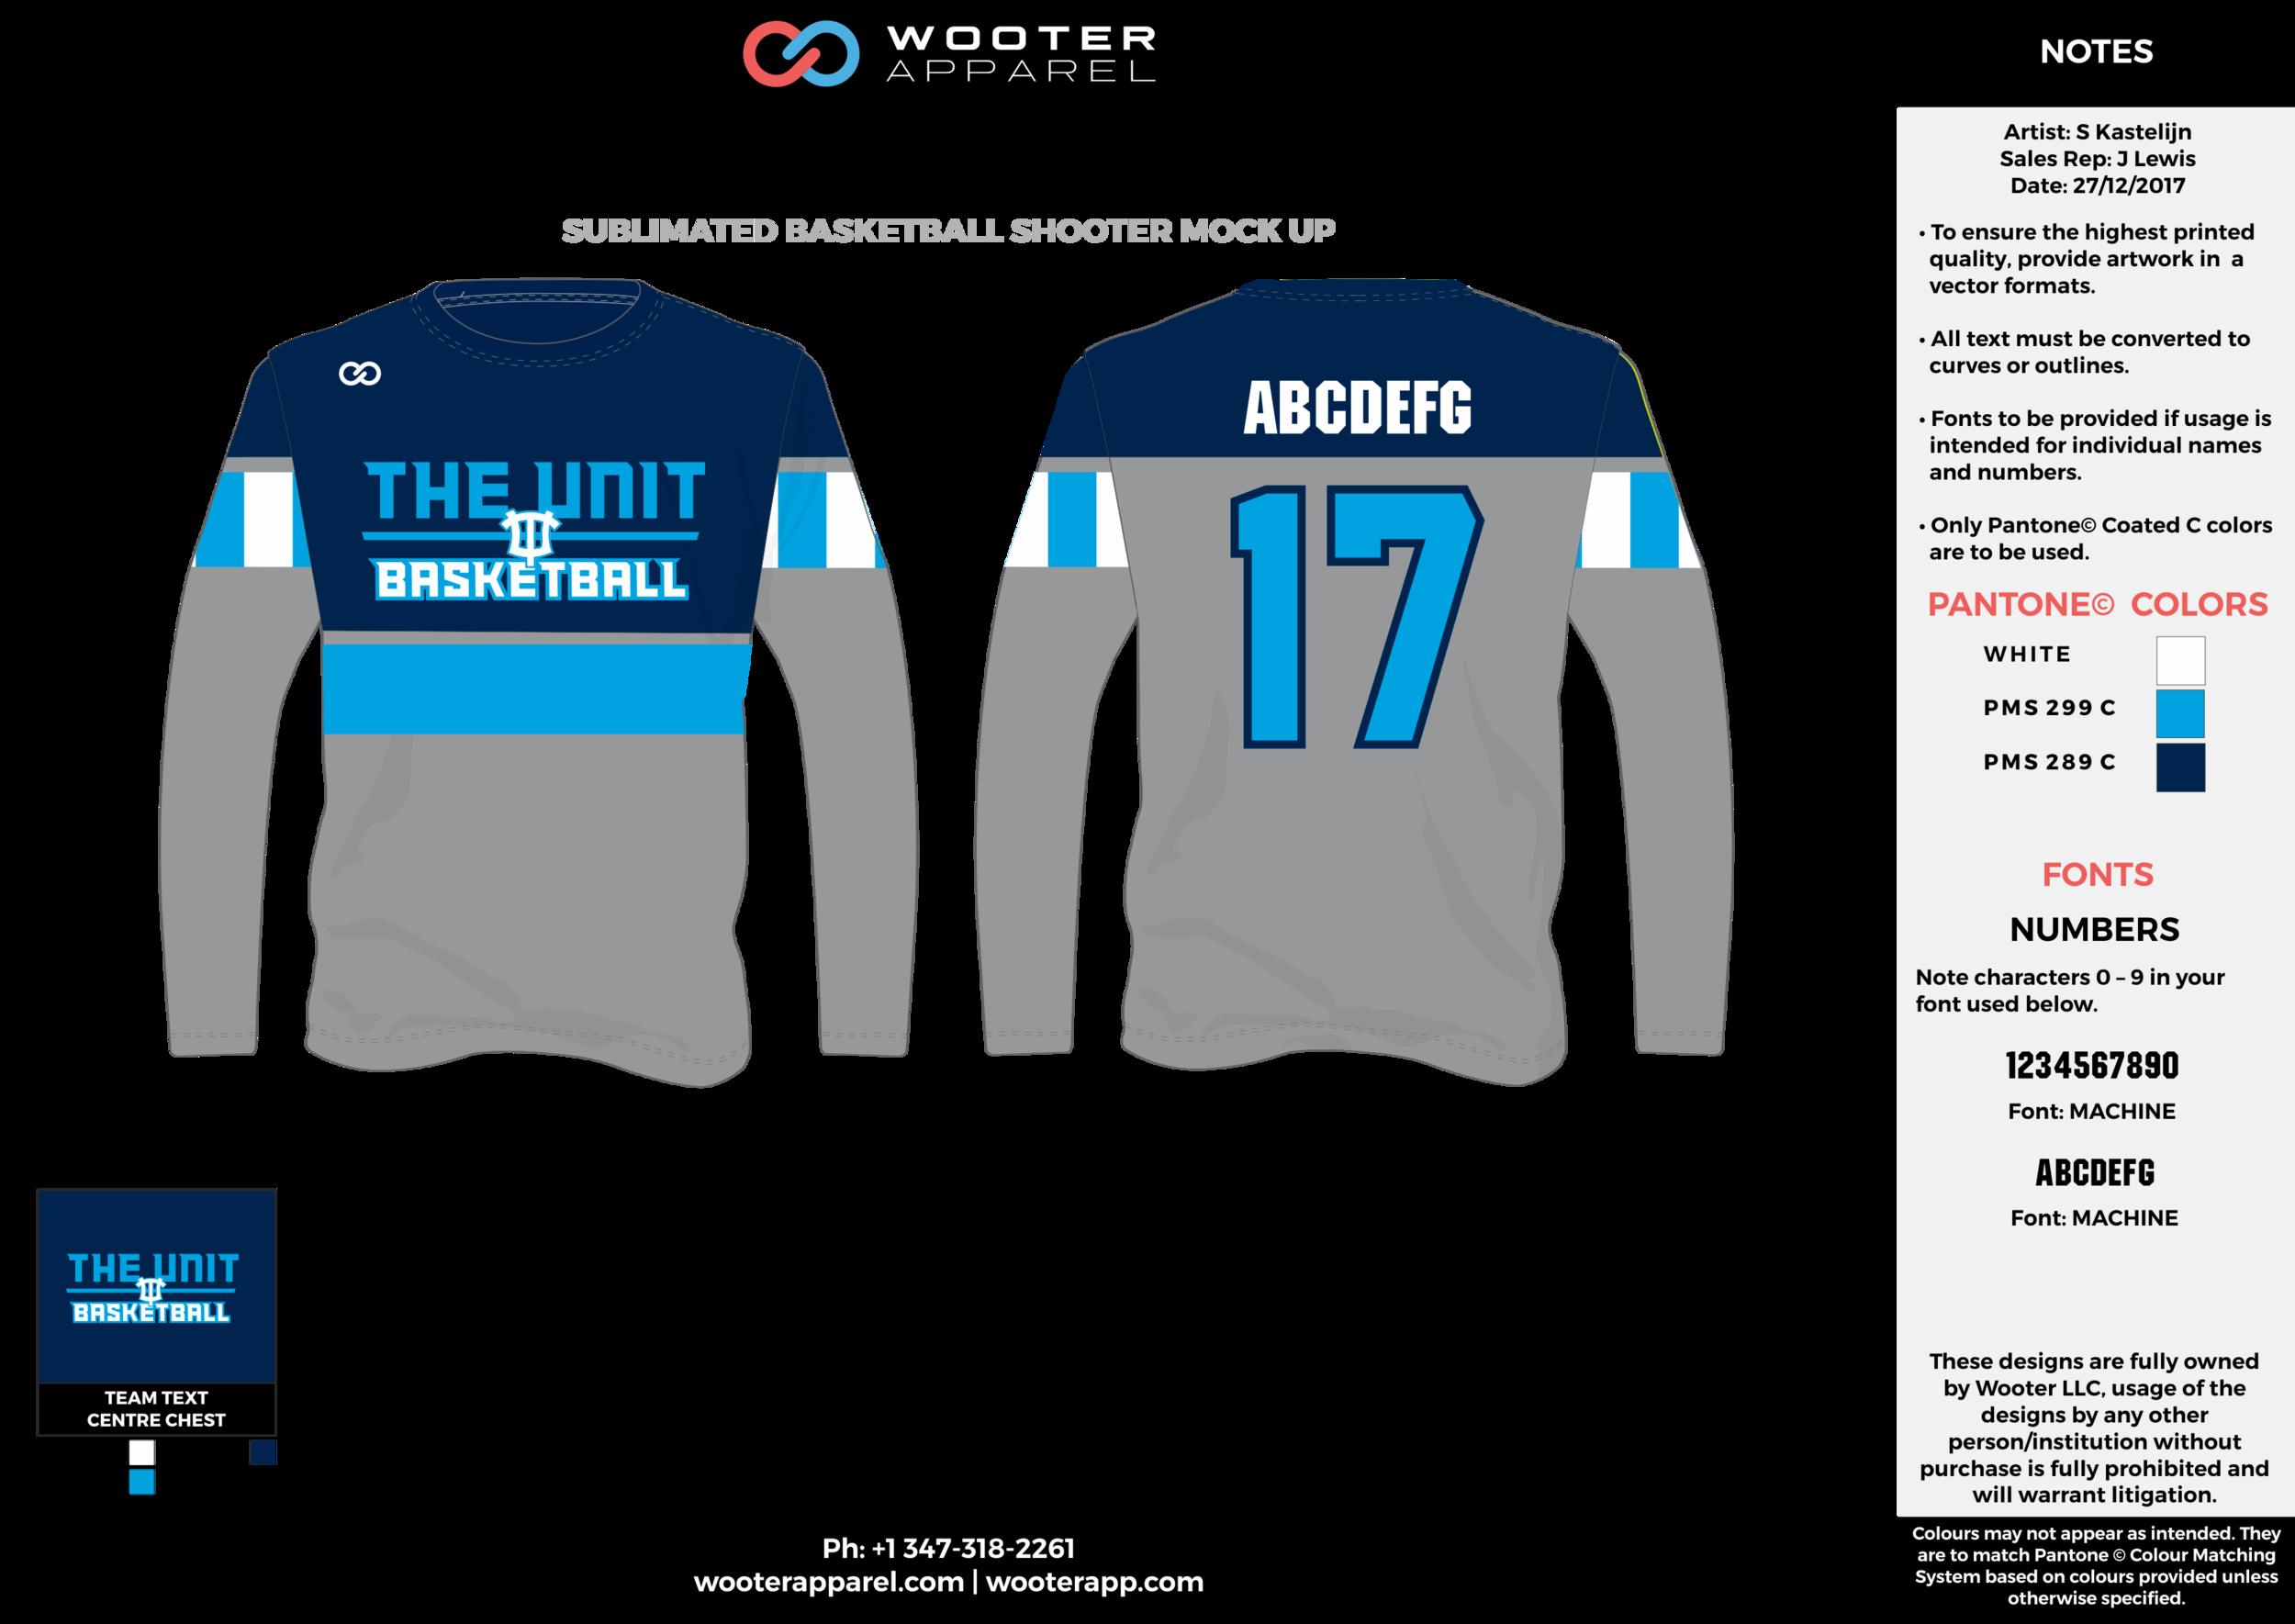 THE UNIT gray blue white dark blue Basketball Long Sleeve Shooting Shirt